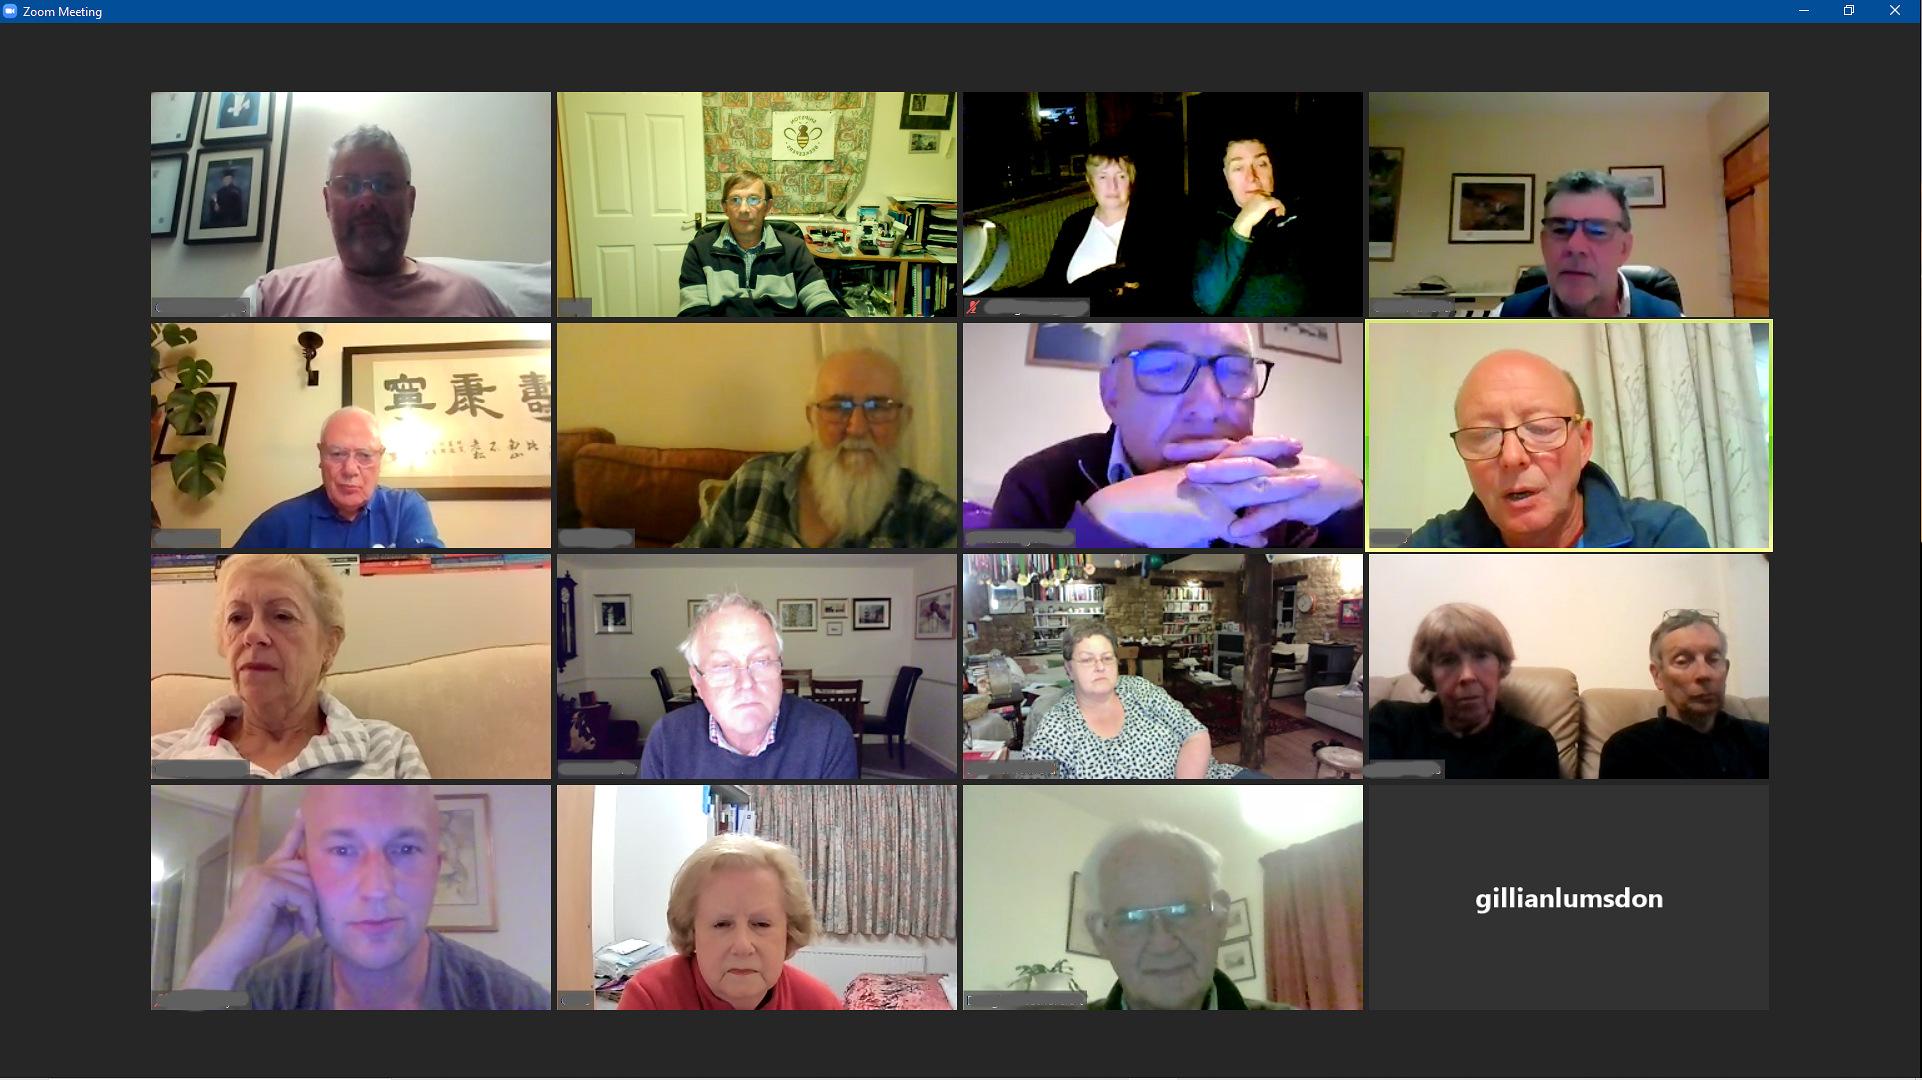 Attendees SBK Virtual 2nd Monday meeting 12 october 2020